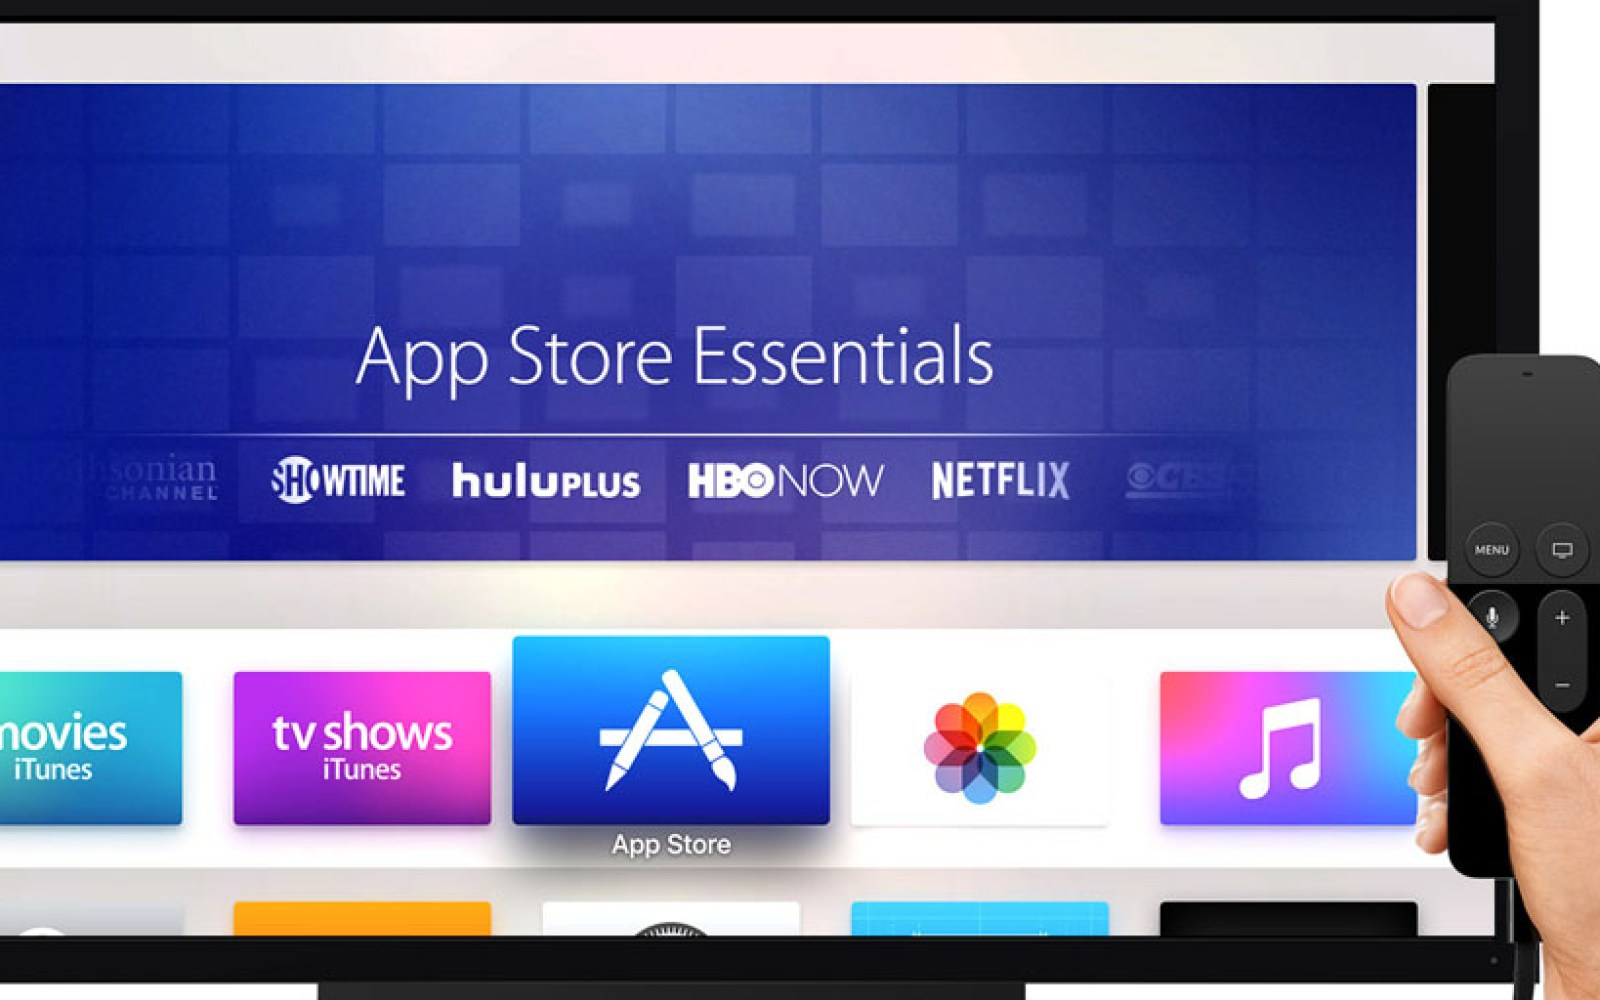 Popular VLC media player app arrives on the new Apple TV